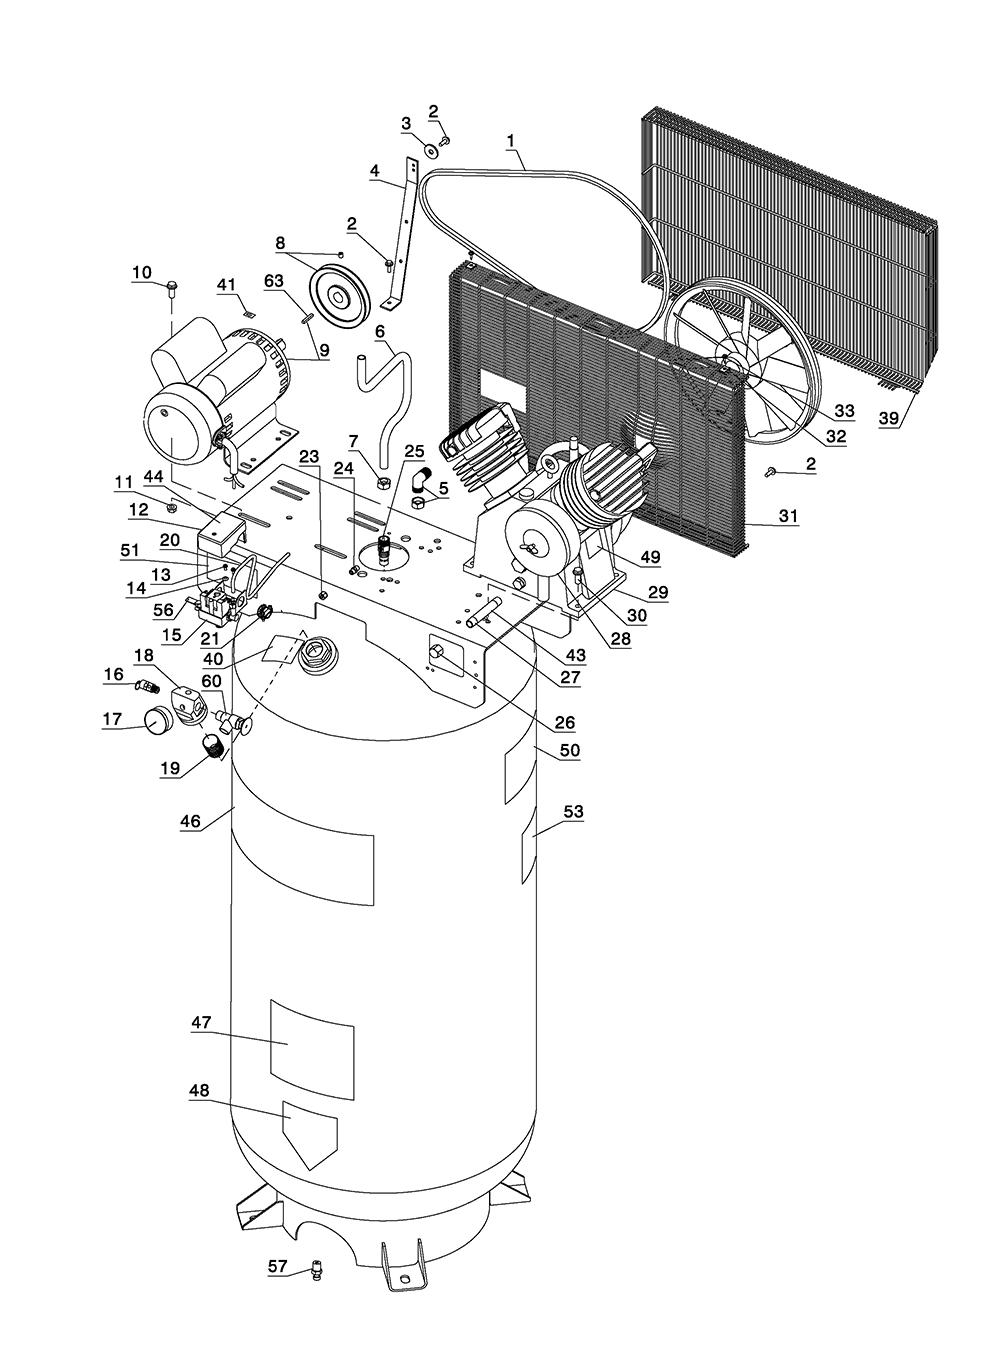 919-16781-BlackandDecker-T0-PB-1Break Down